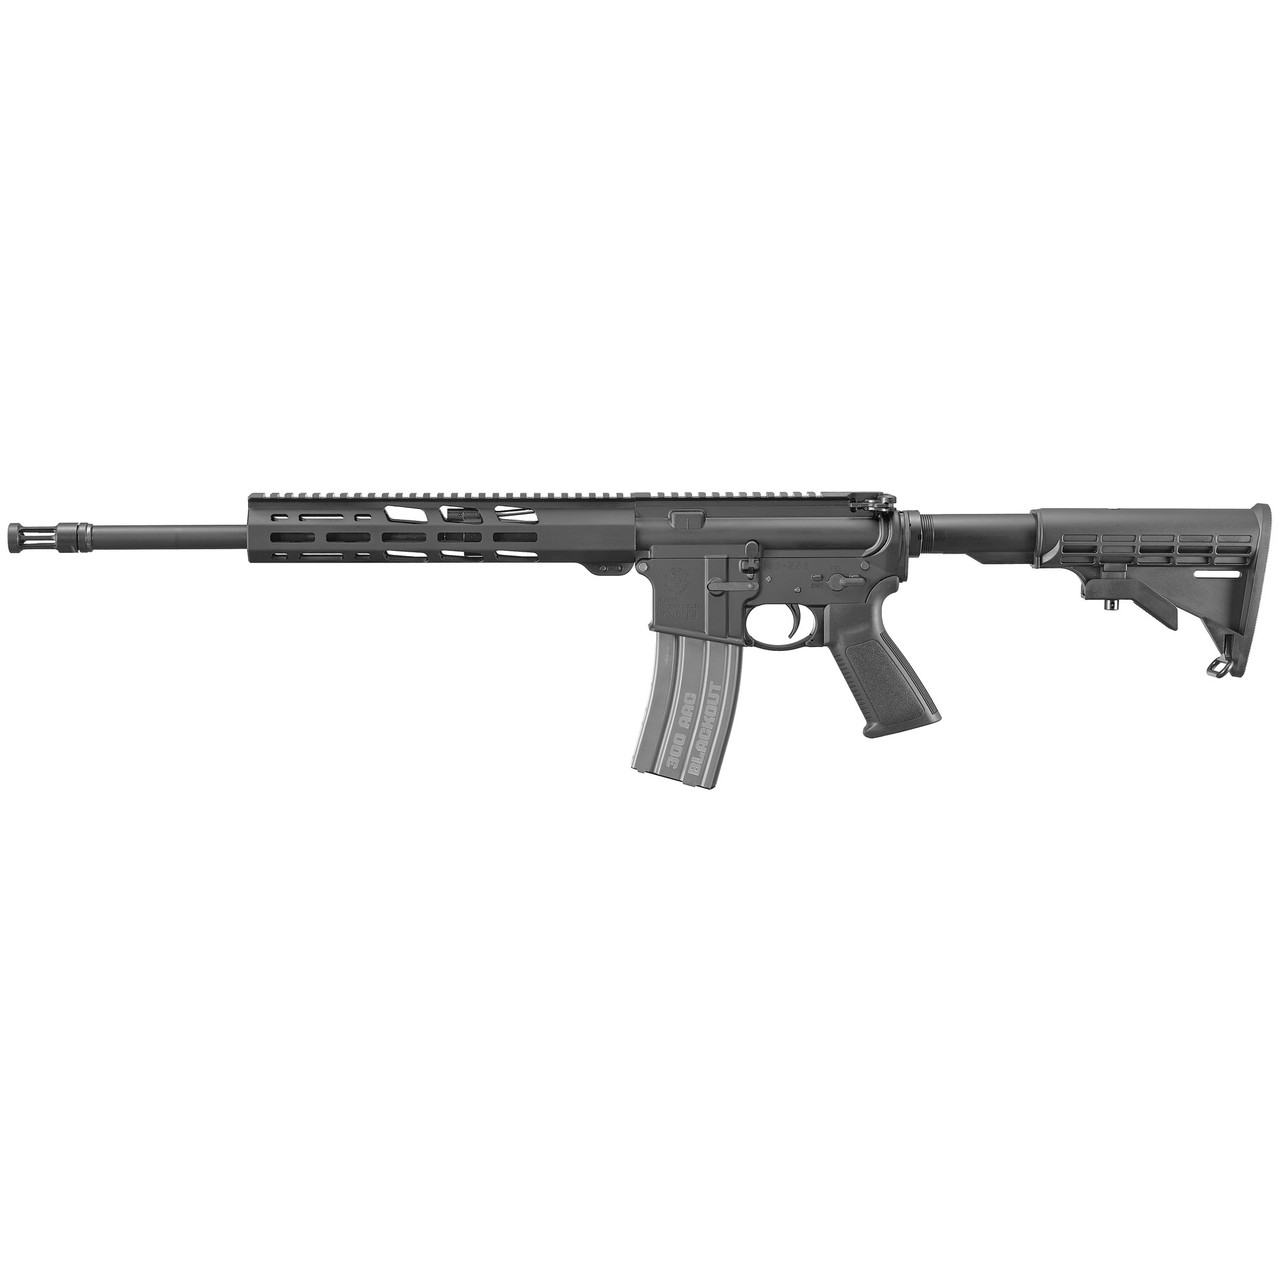 Ruger AR-556 FFH CALIFORNIA LEGAL - .300 Blackout